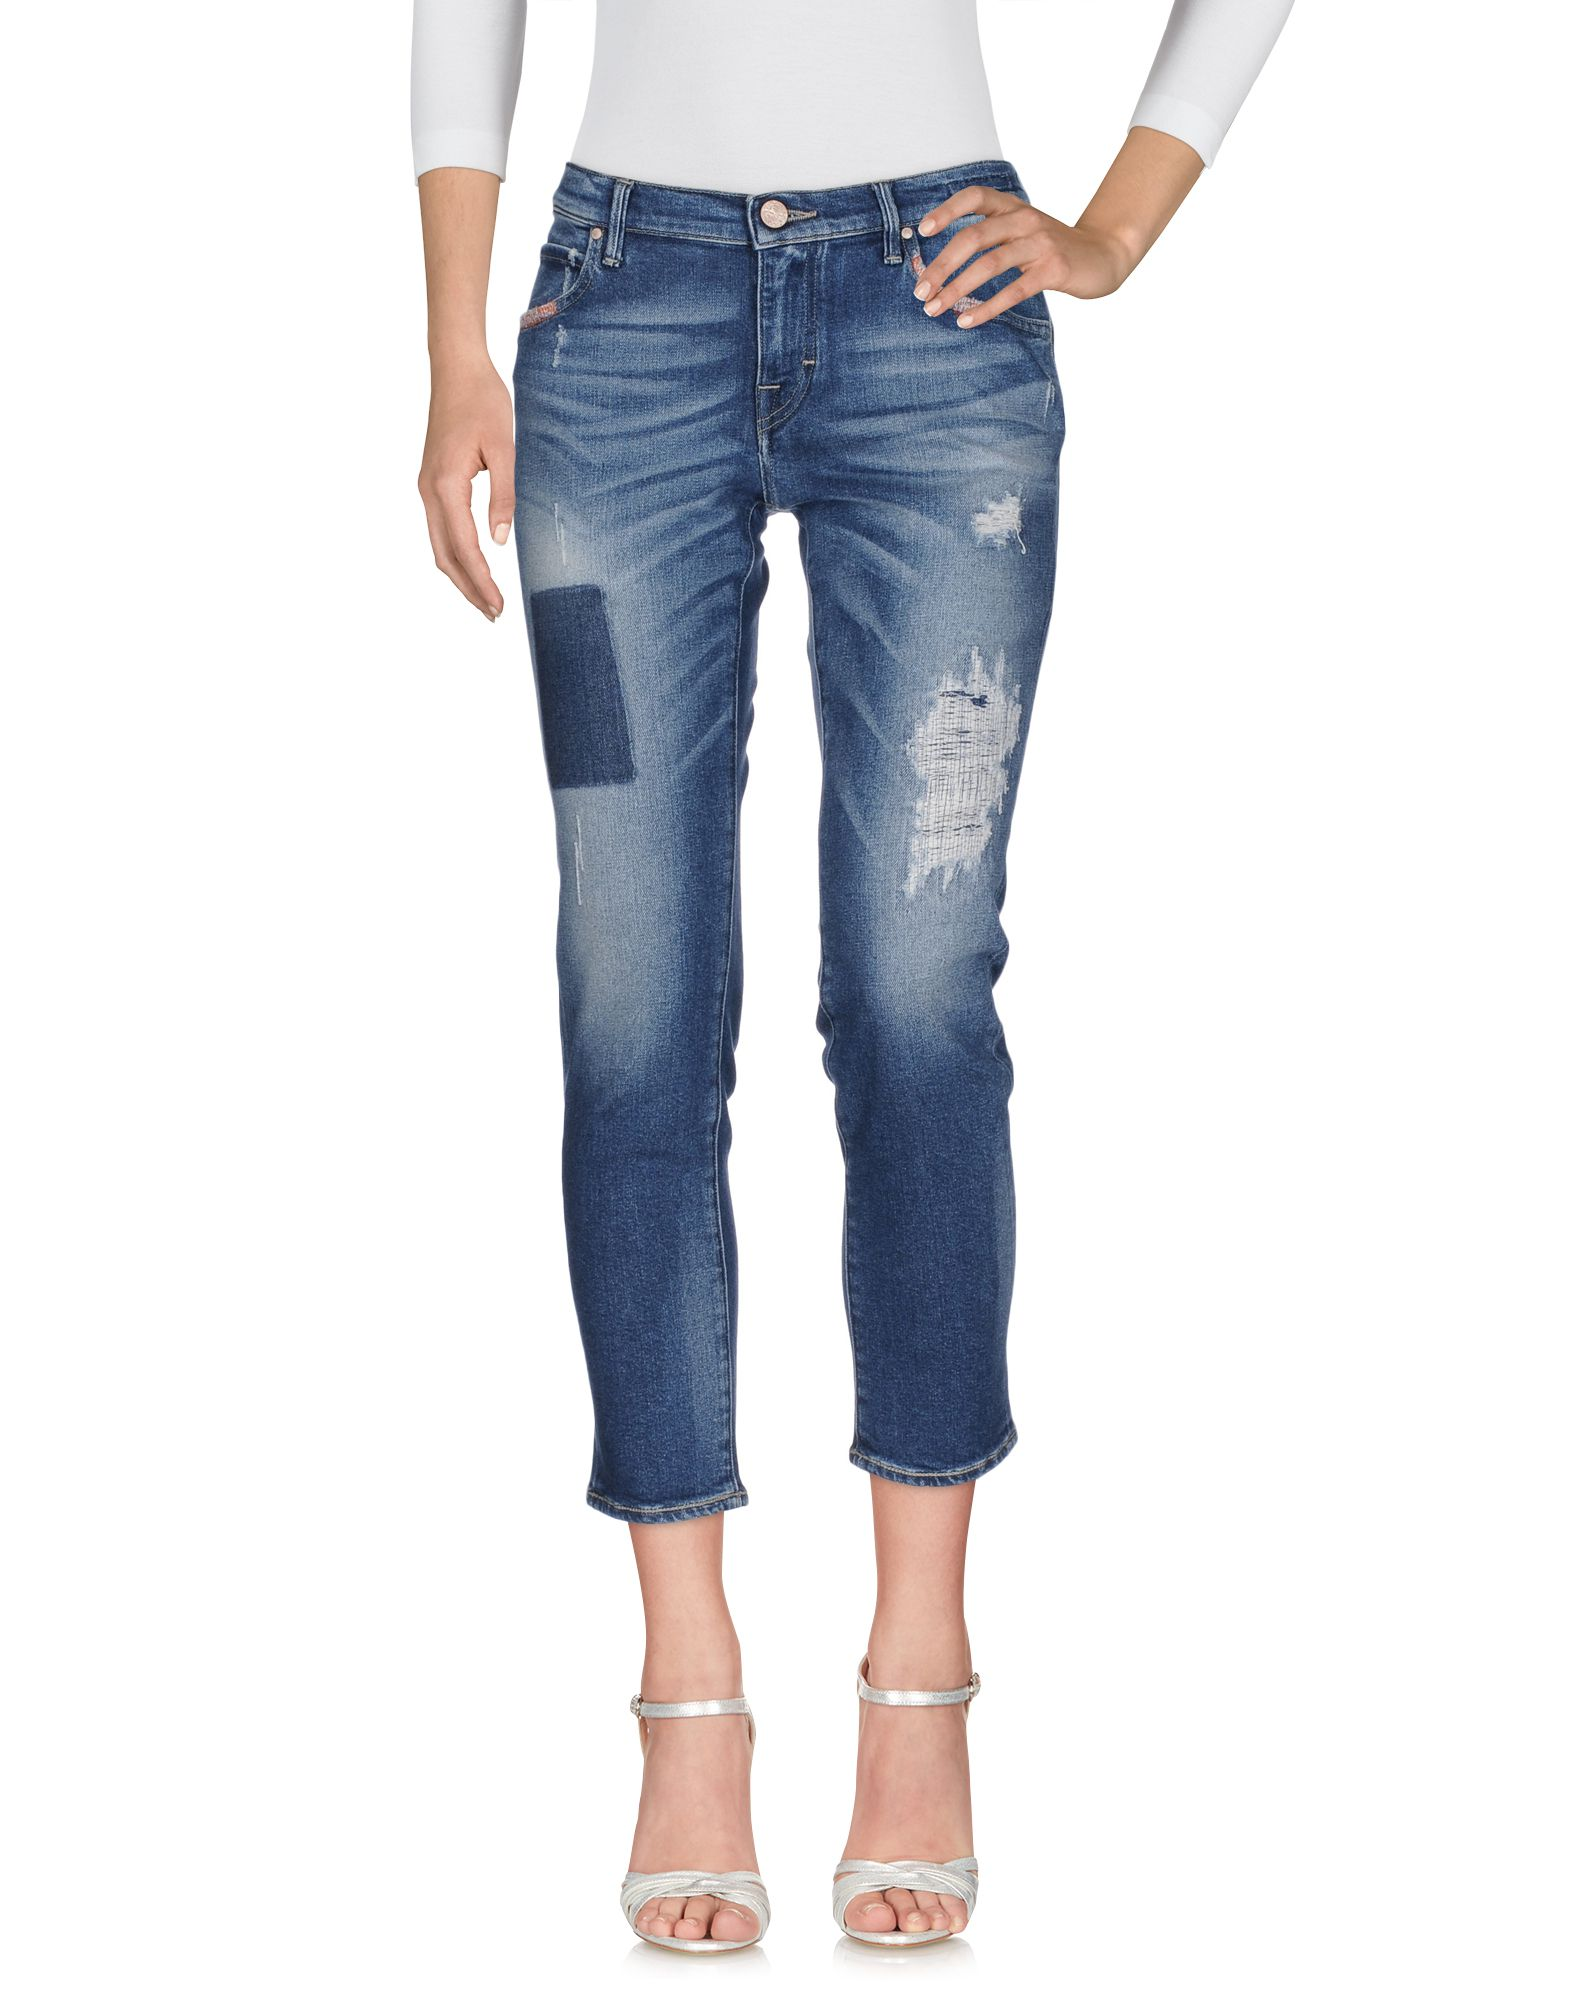 Pantaloni Jeans Jacob Cohёn Donna - Acquista online su zjD09zV6M